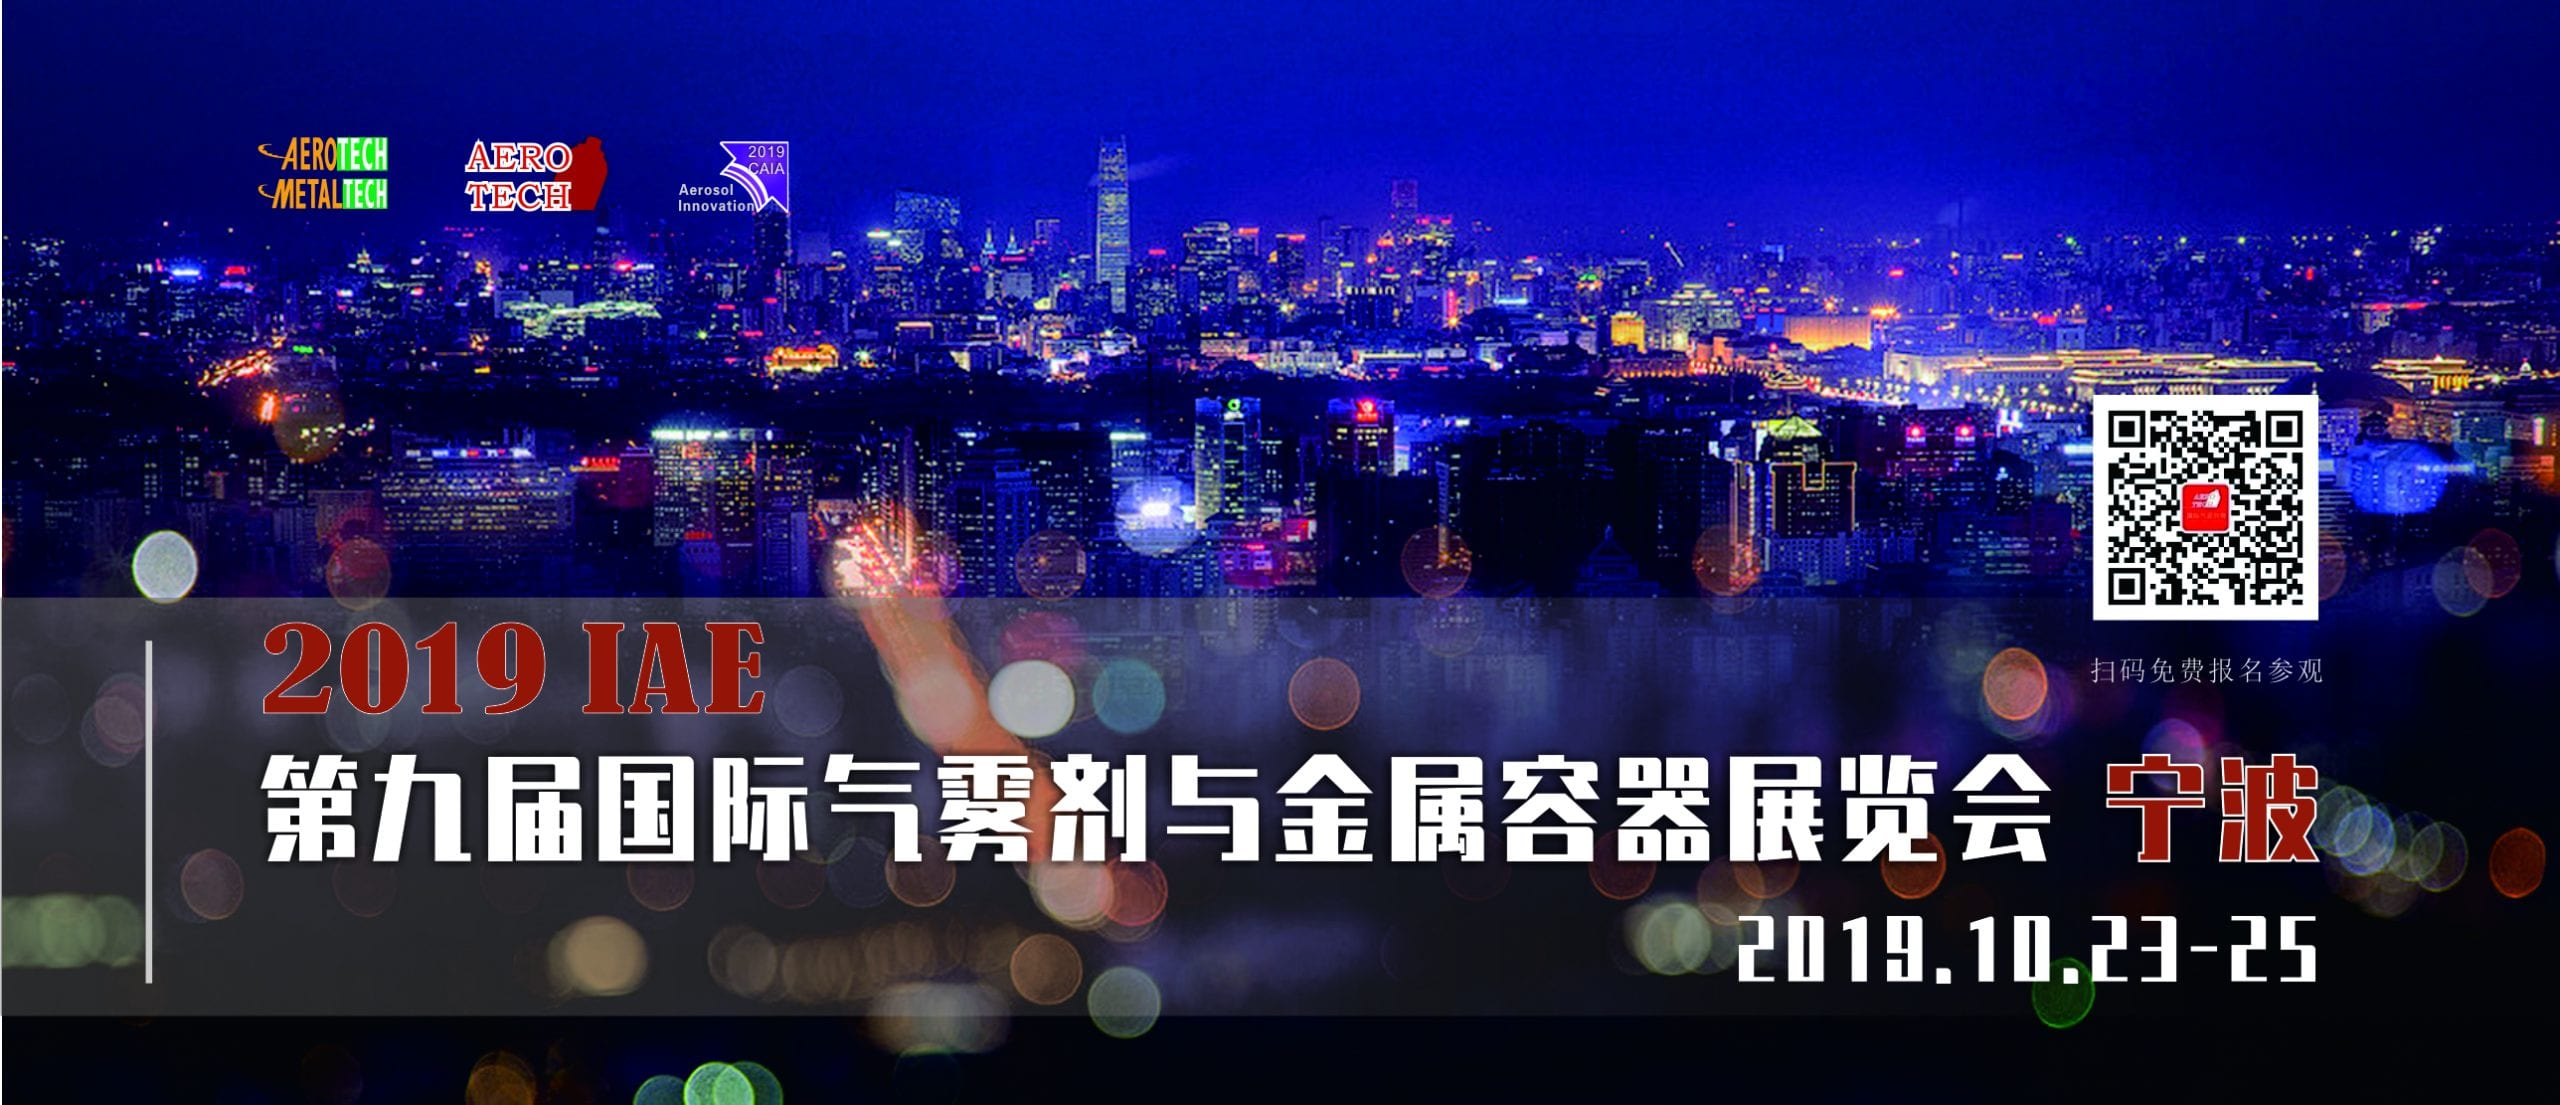 Ningbo Aerosol China